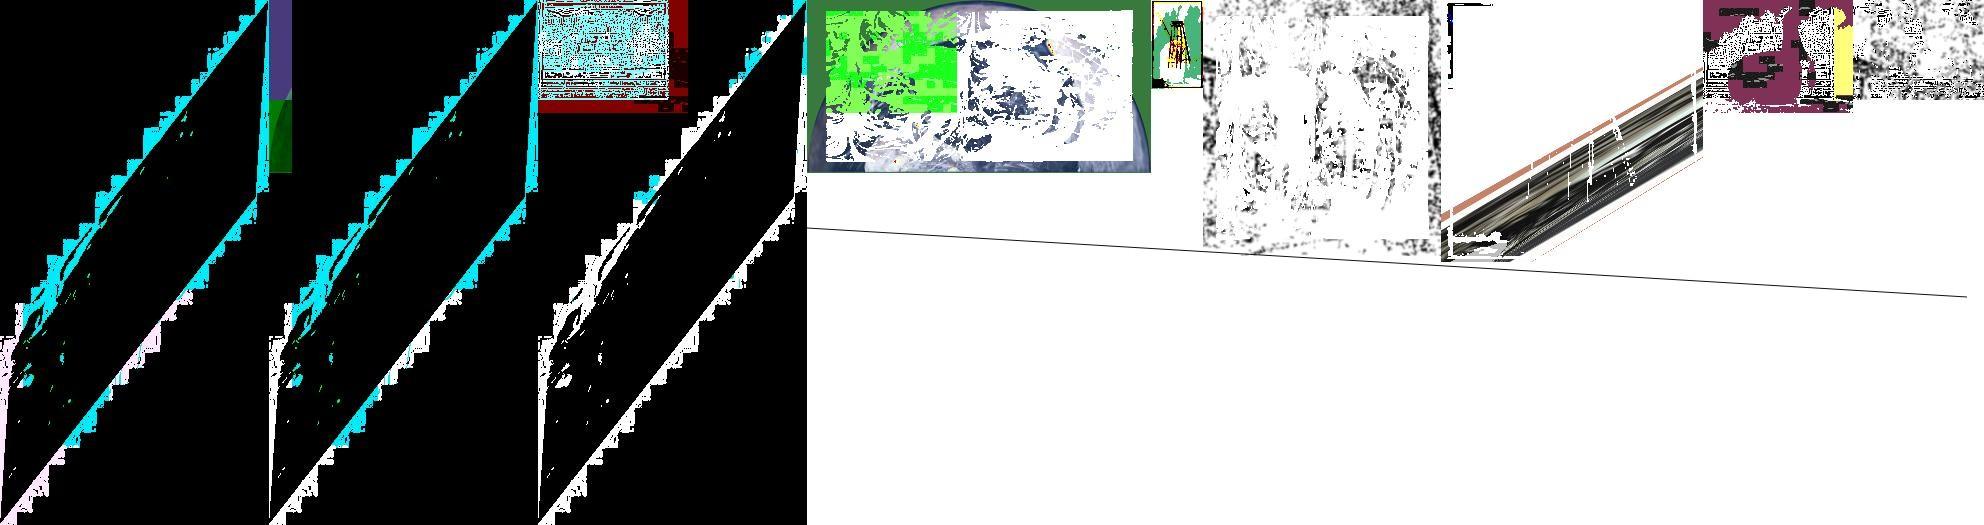 Hell,_landscape,_history,_duck,_eroticism--1106-13252-99987-8672-11977.jpg